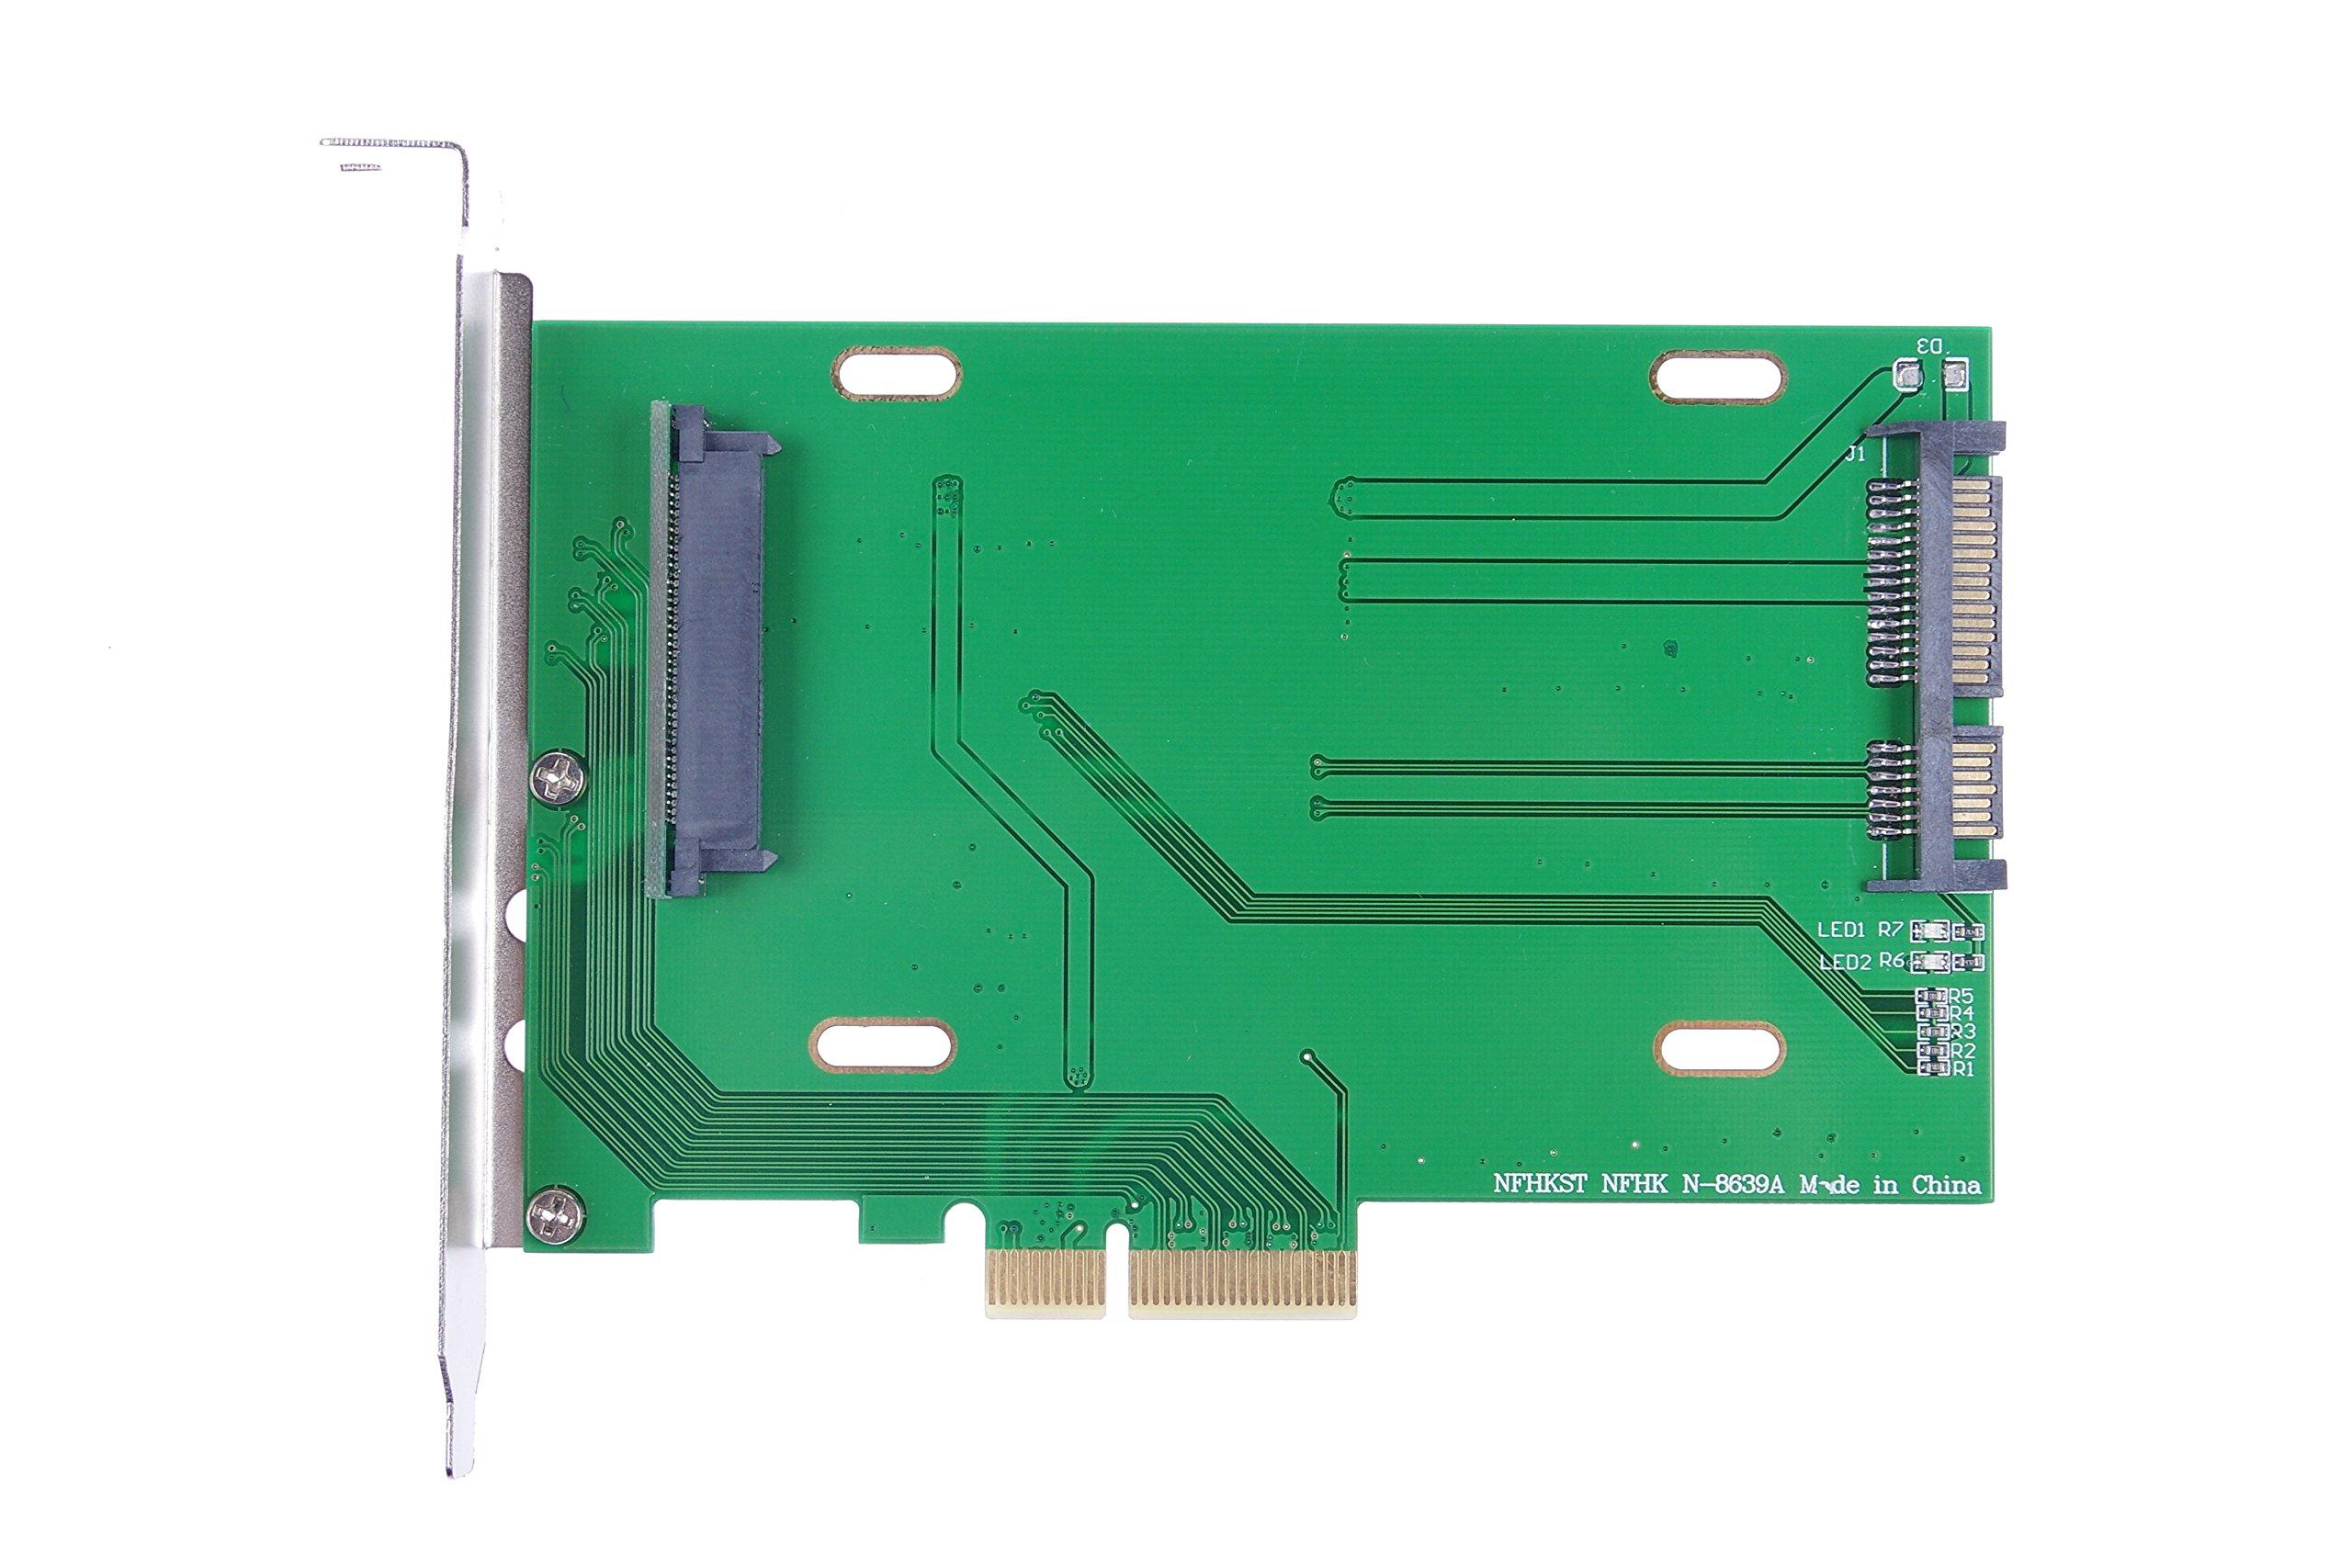 KNACRO PCI-E 3.0 x4 Lane to U.2 U2 Kit SFF-8639 Host Adapter for Intel Motherboard & 750 NVMe PCIe SSD